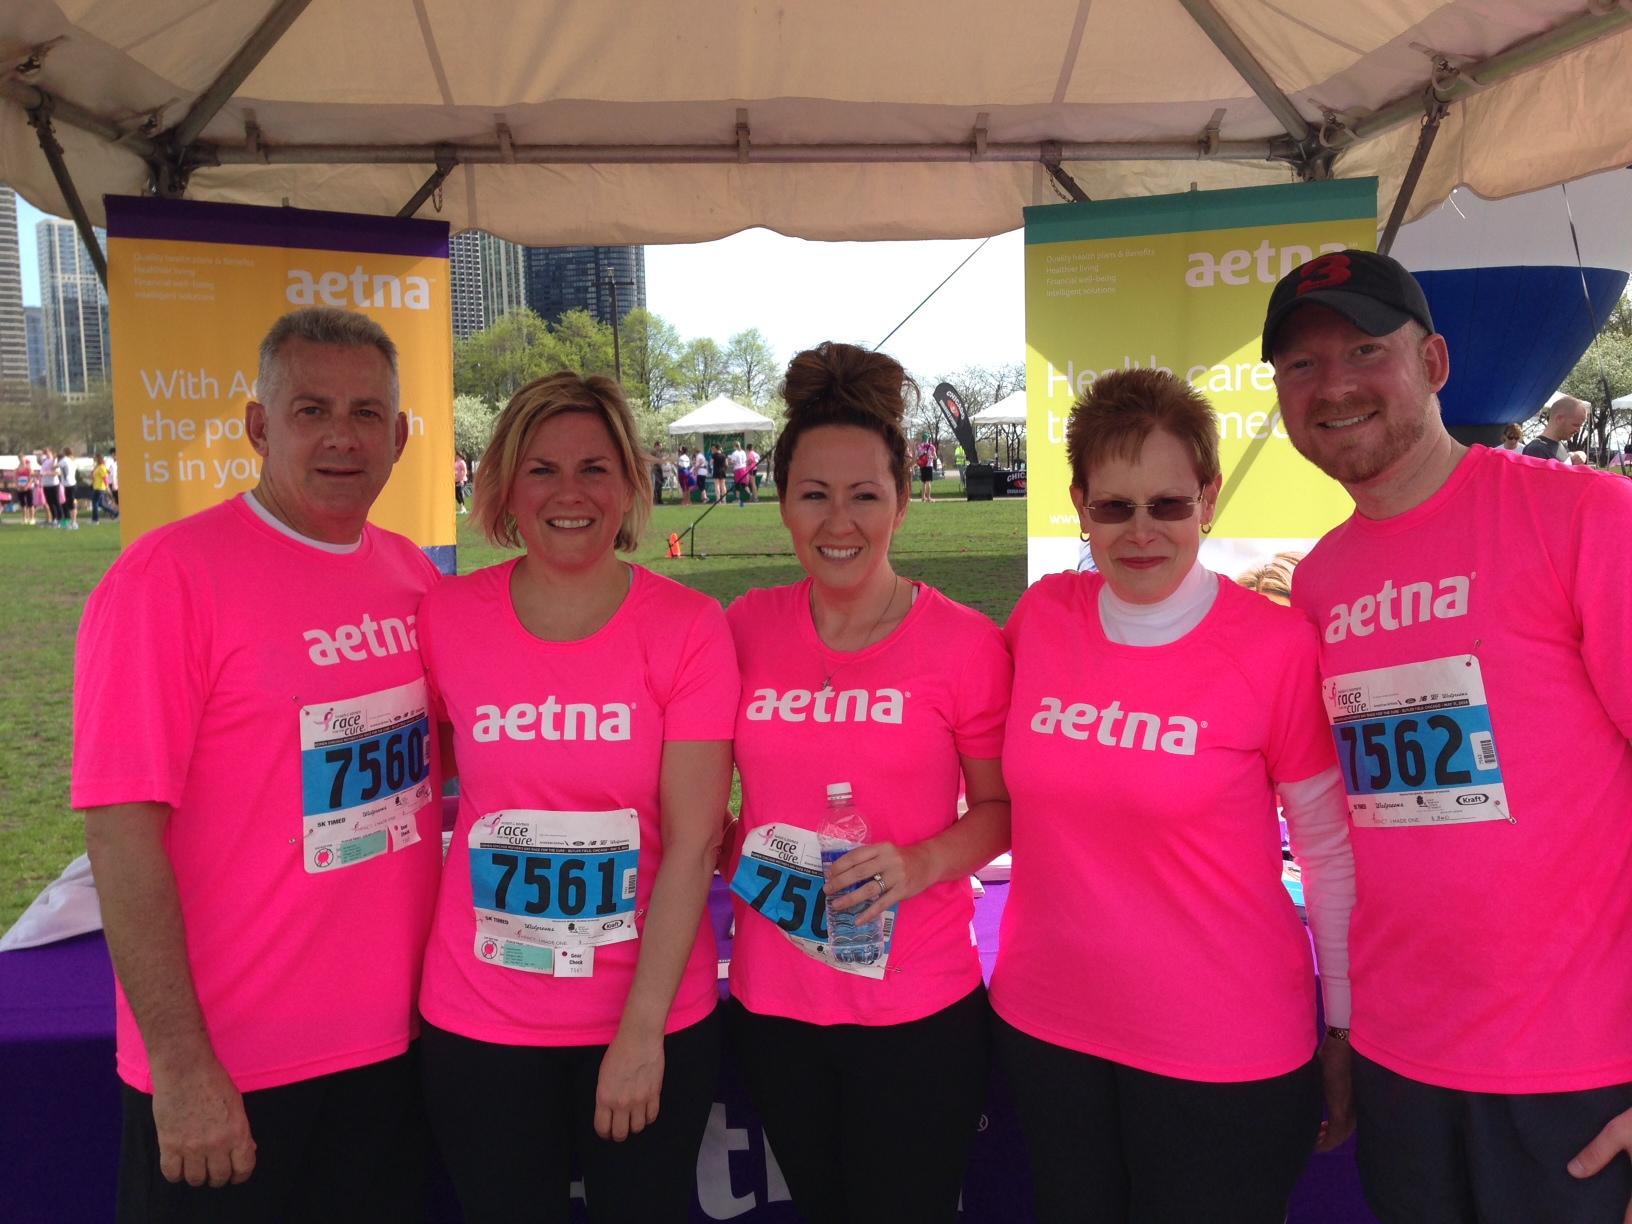 Team Aetna